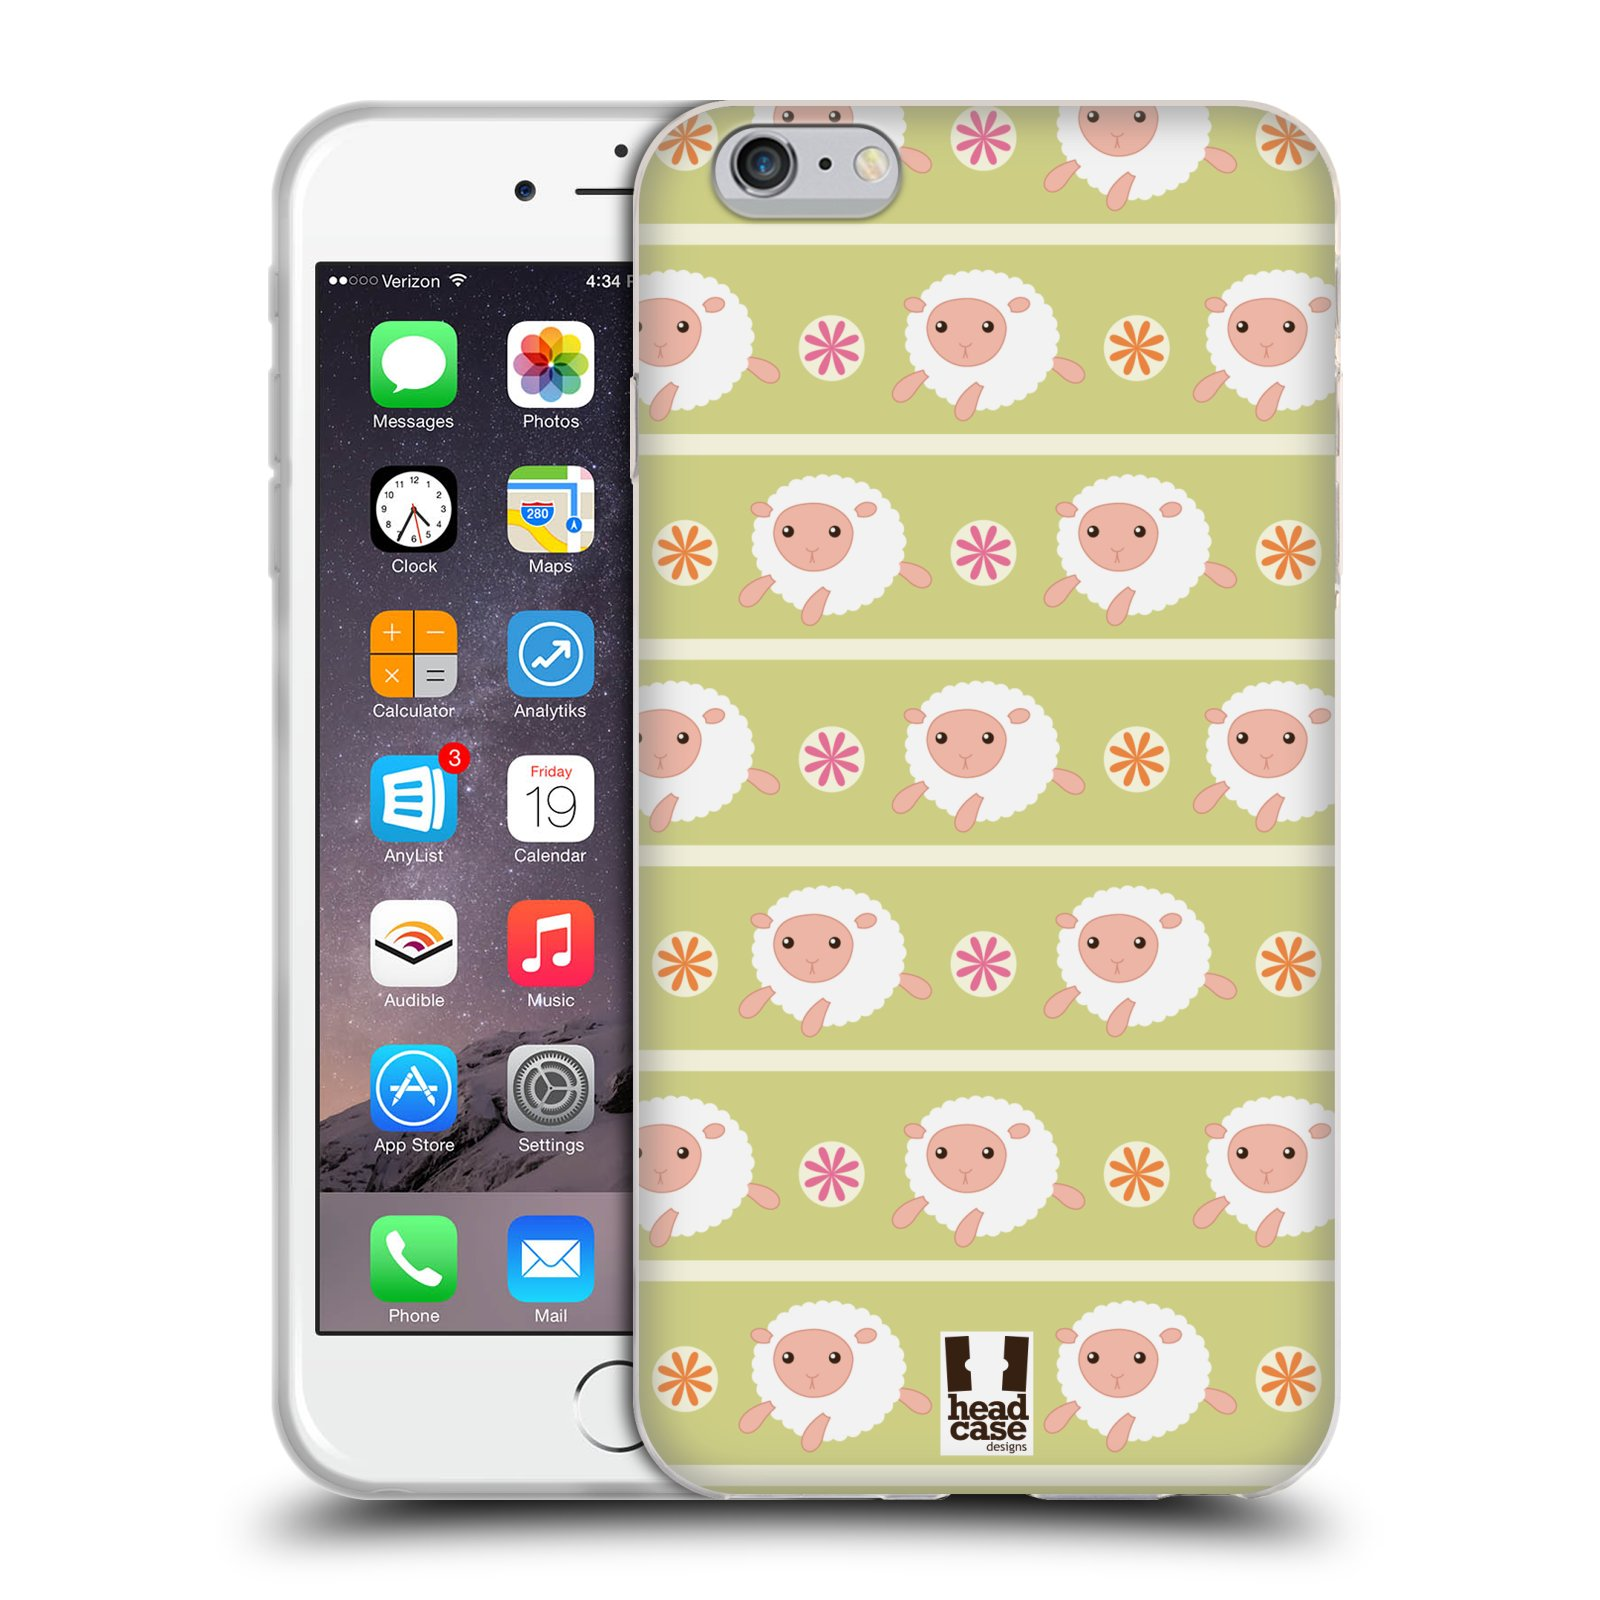 HEAD CASE silikonový obal na mobil Apple Iphone 6 PLUS/ 6S PLUS vzor roztomilé zvířecí vzory ovečky